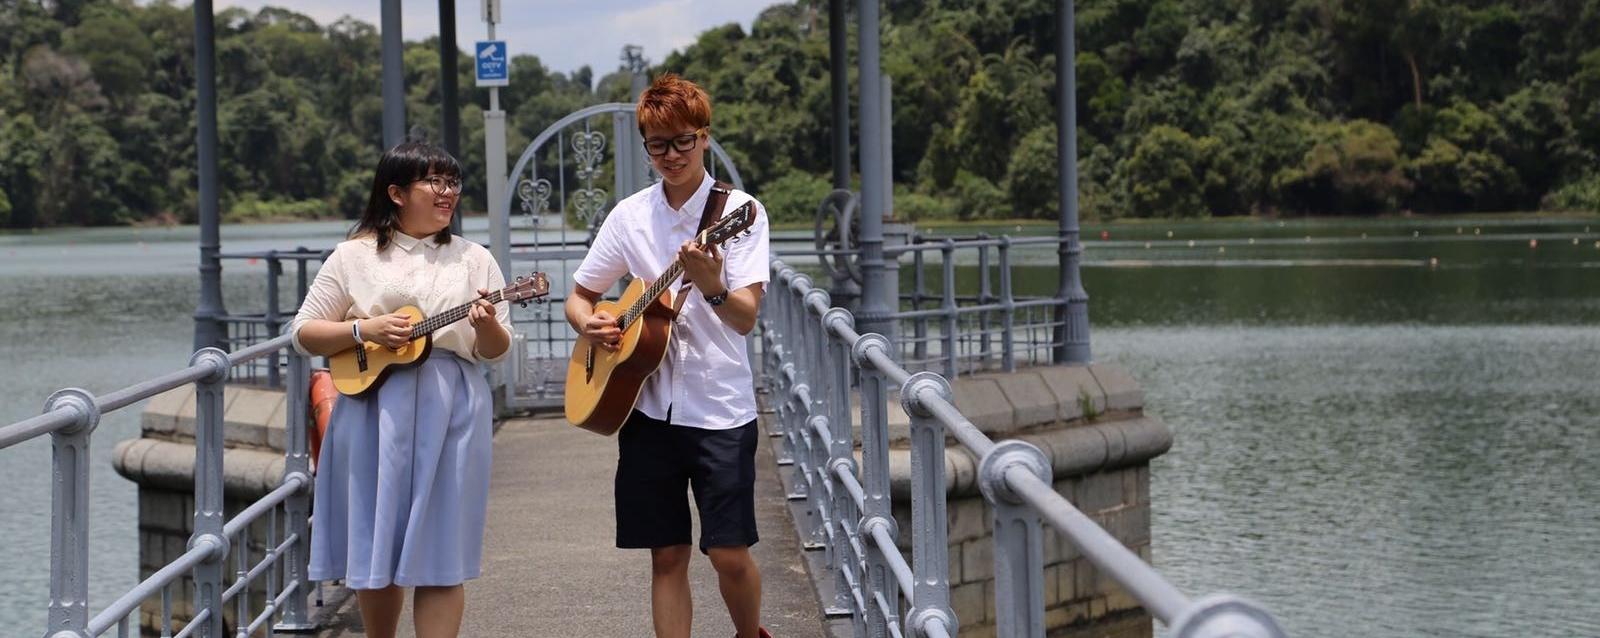 Esplanade Presents: Red Dot August -  Only.唯一 [Irwin & Eli]